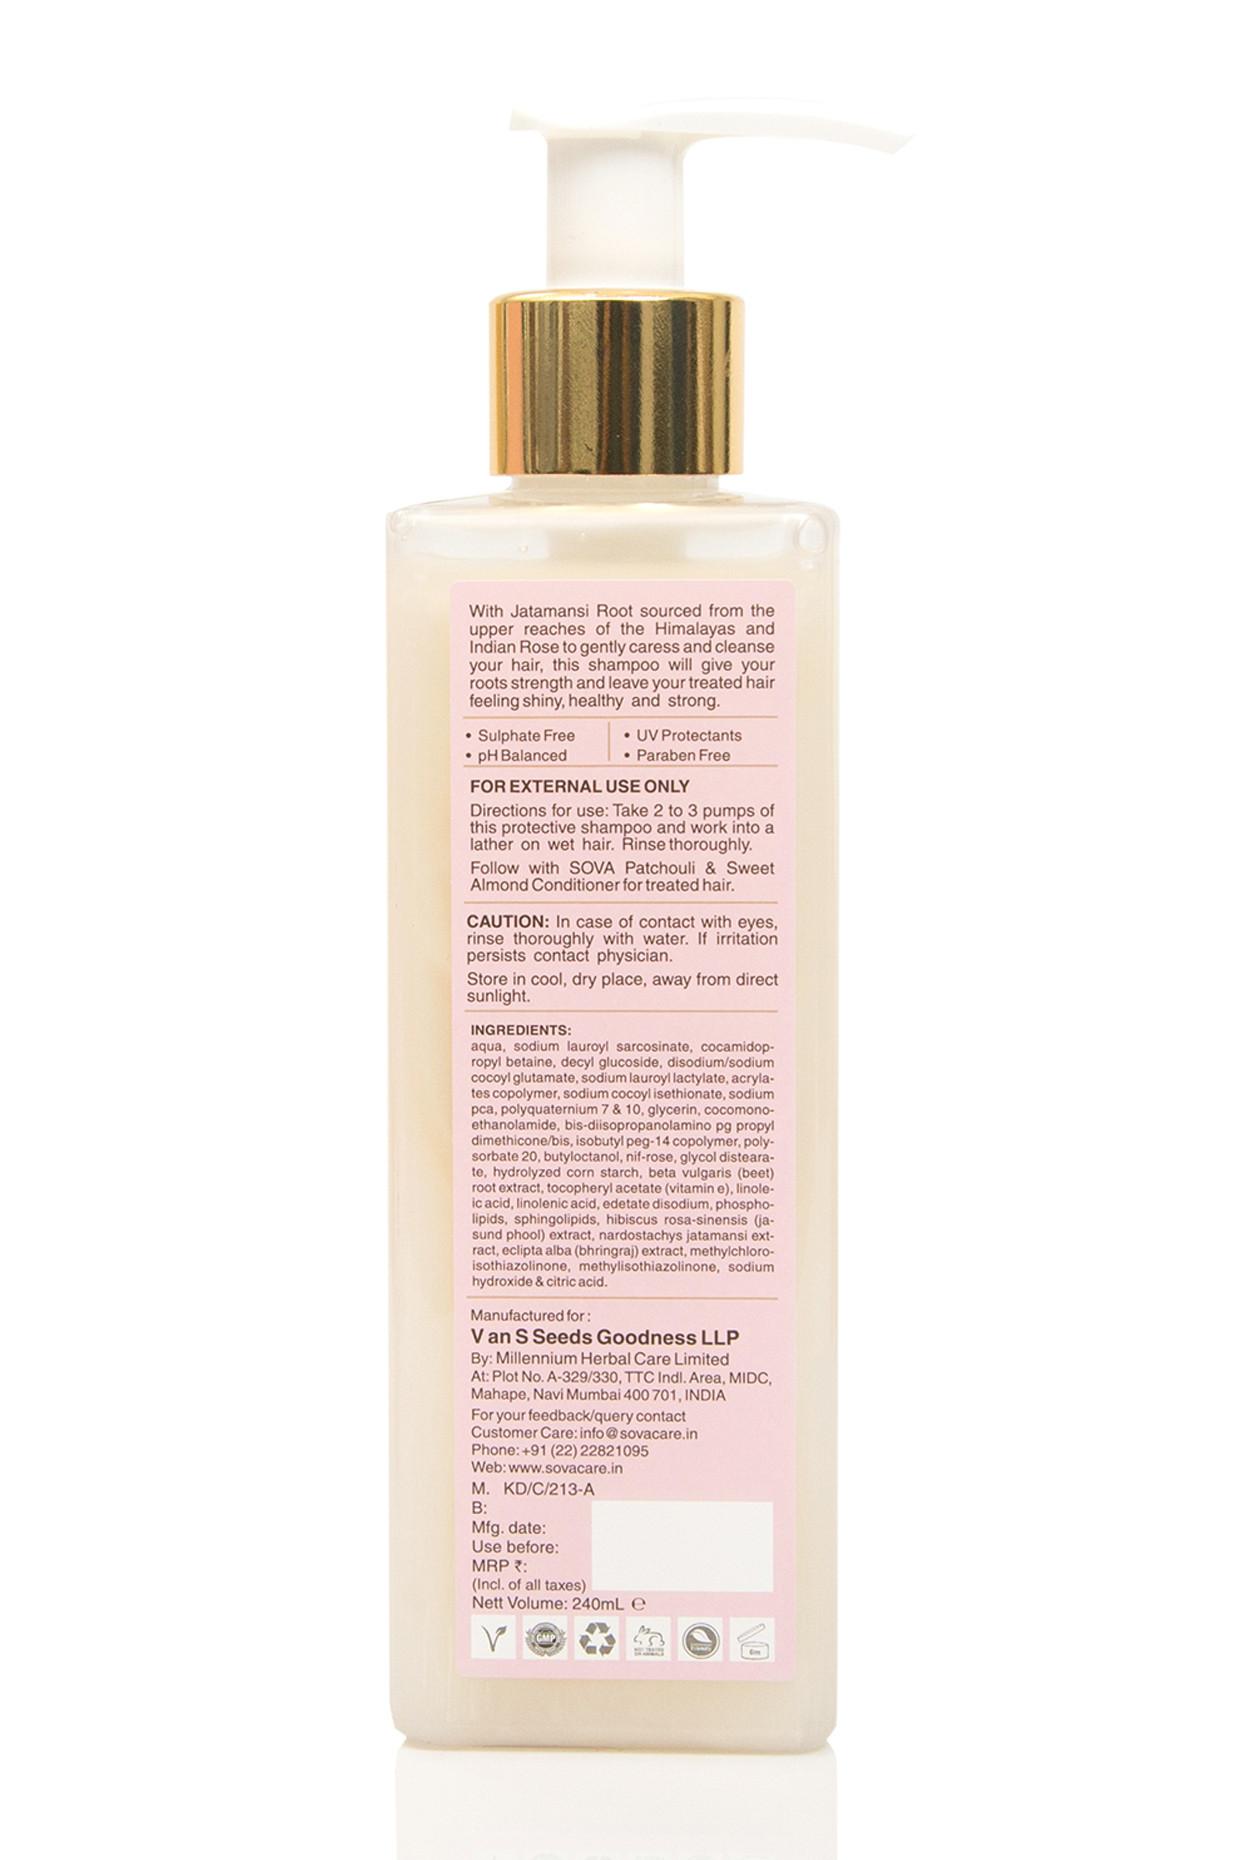 Indian Rose & Jatamansi Root Shampoo For Treated Hair by SOVA